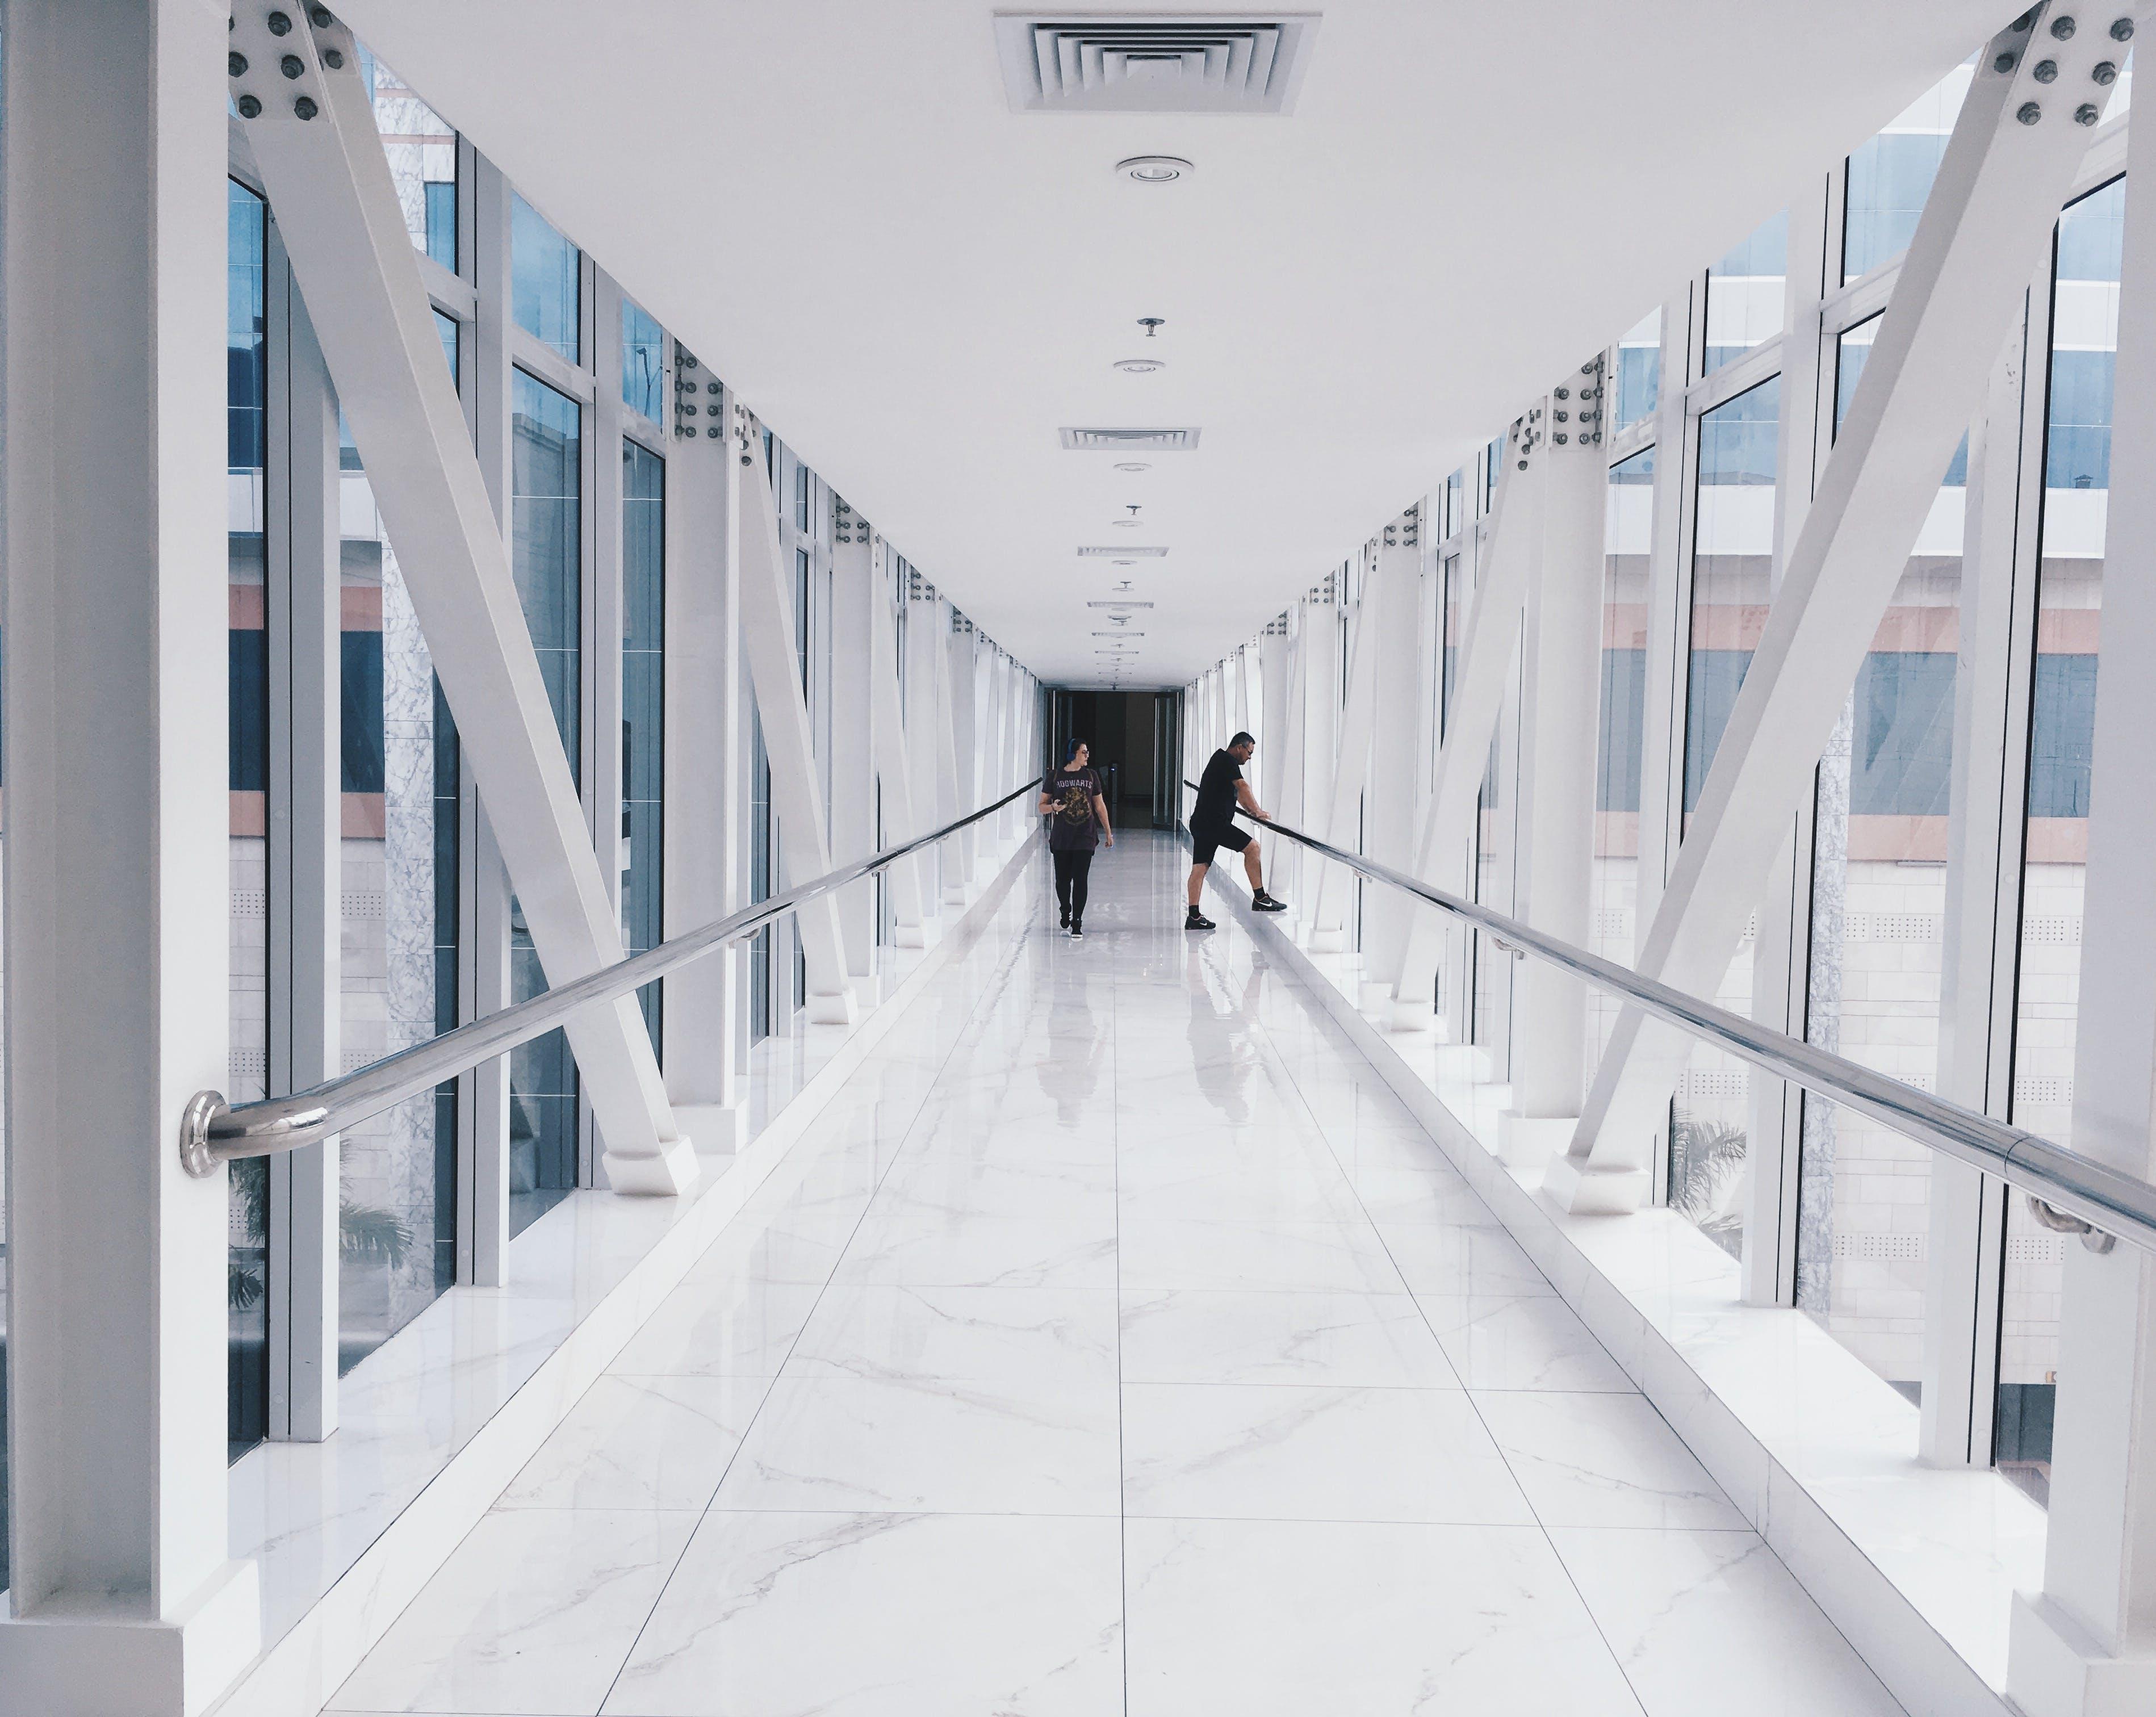 Two People Standing on Hallway Near Glass Window